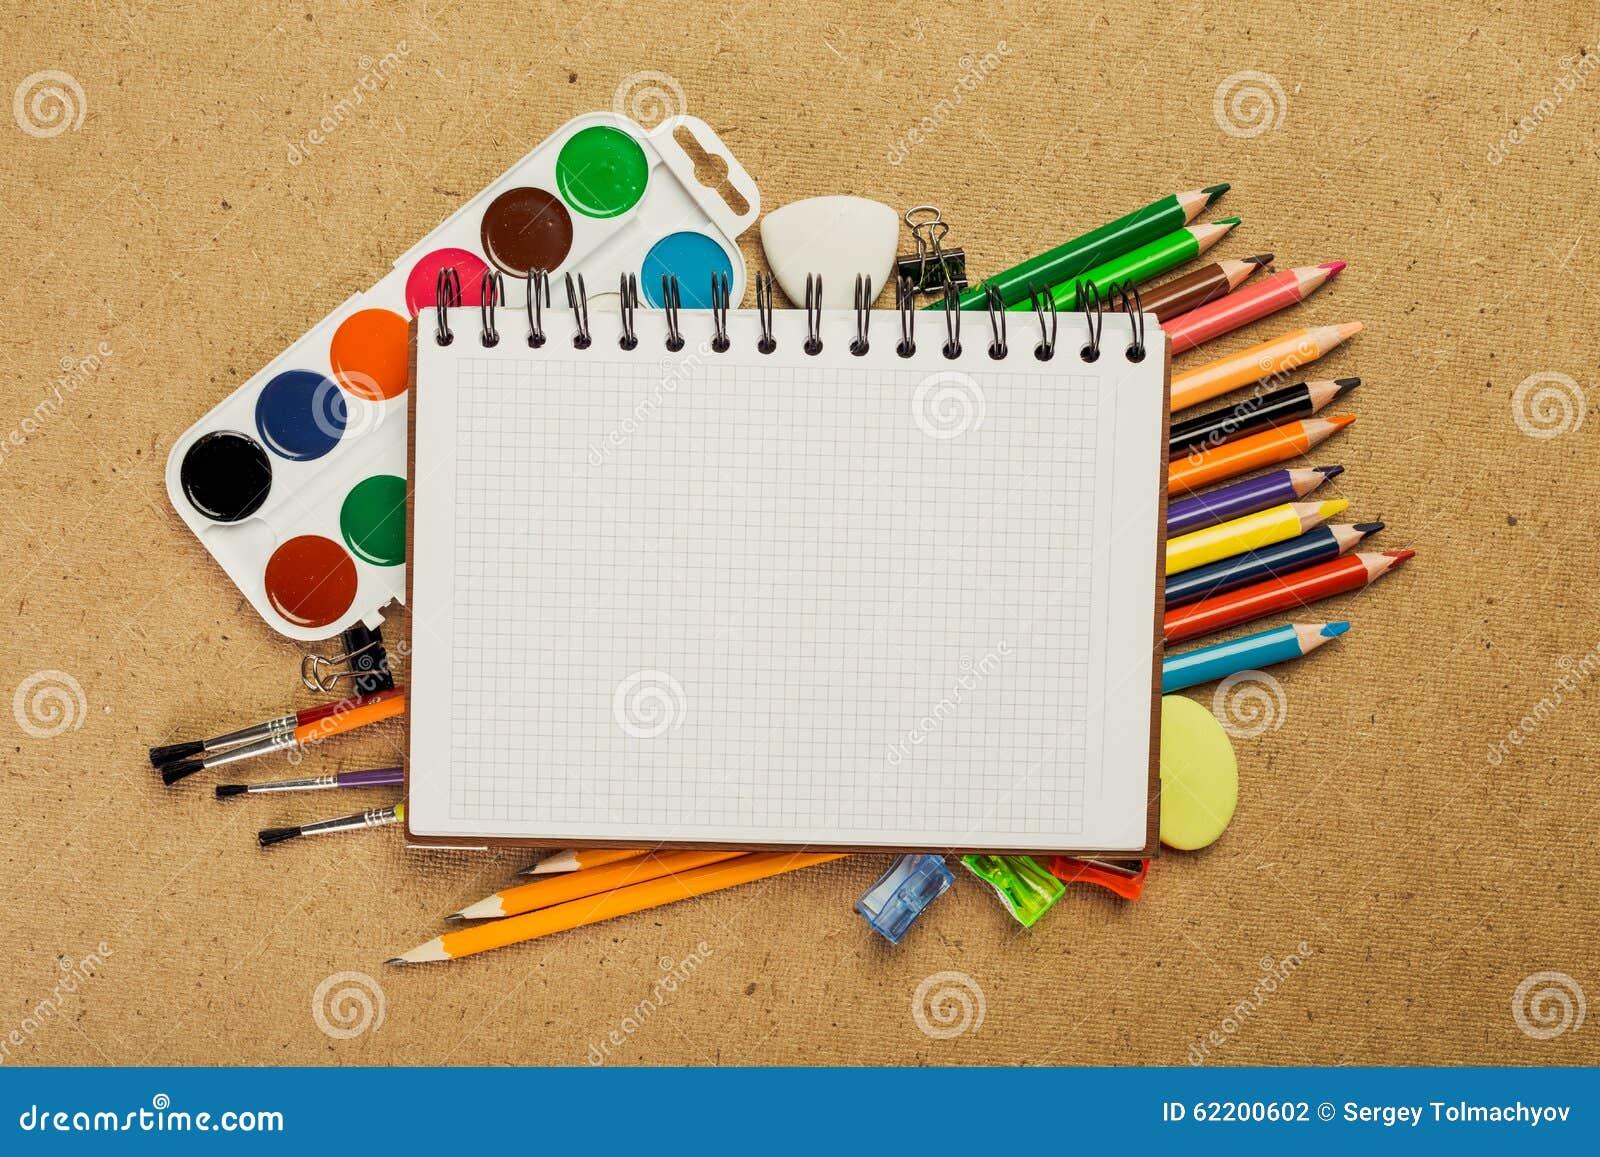 Equipos de dibujo